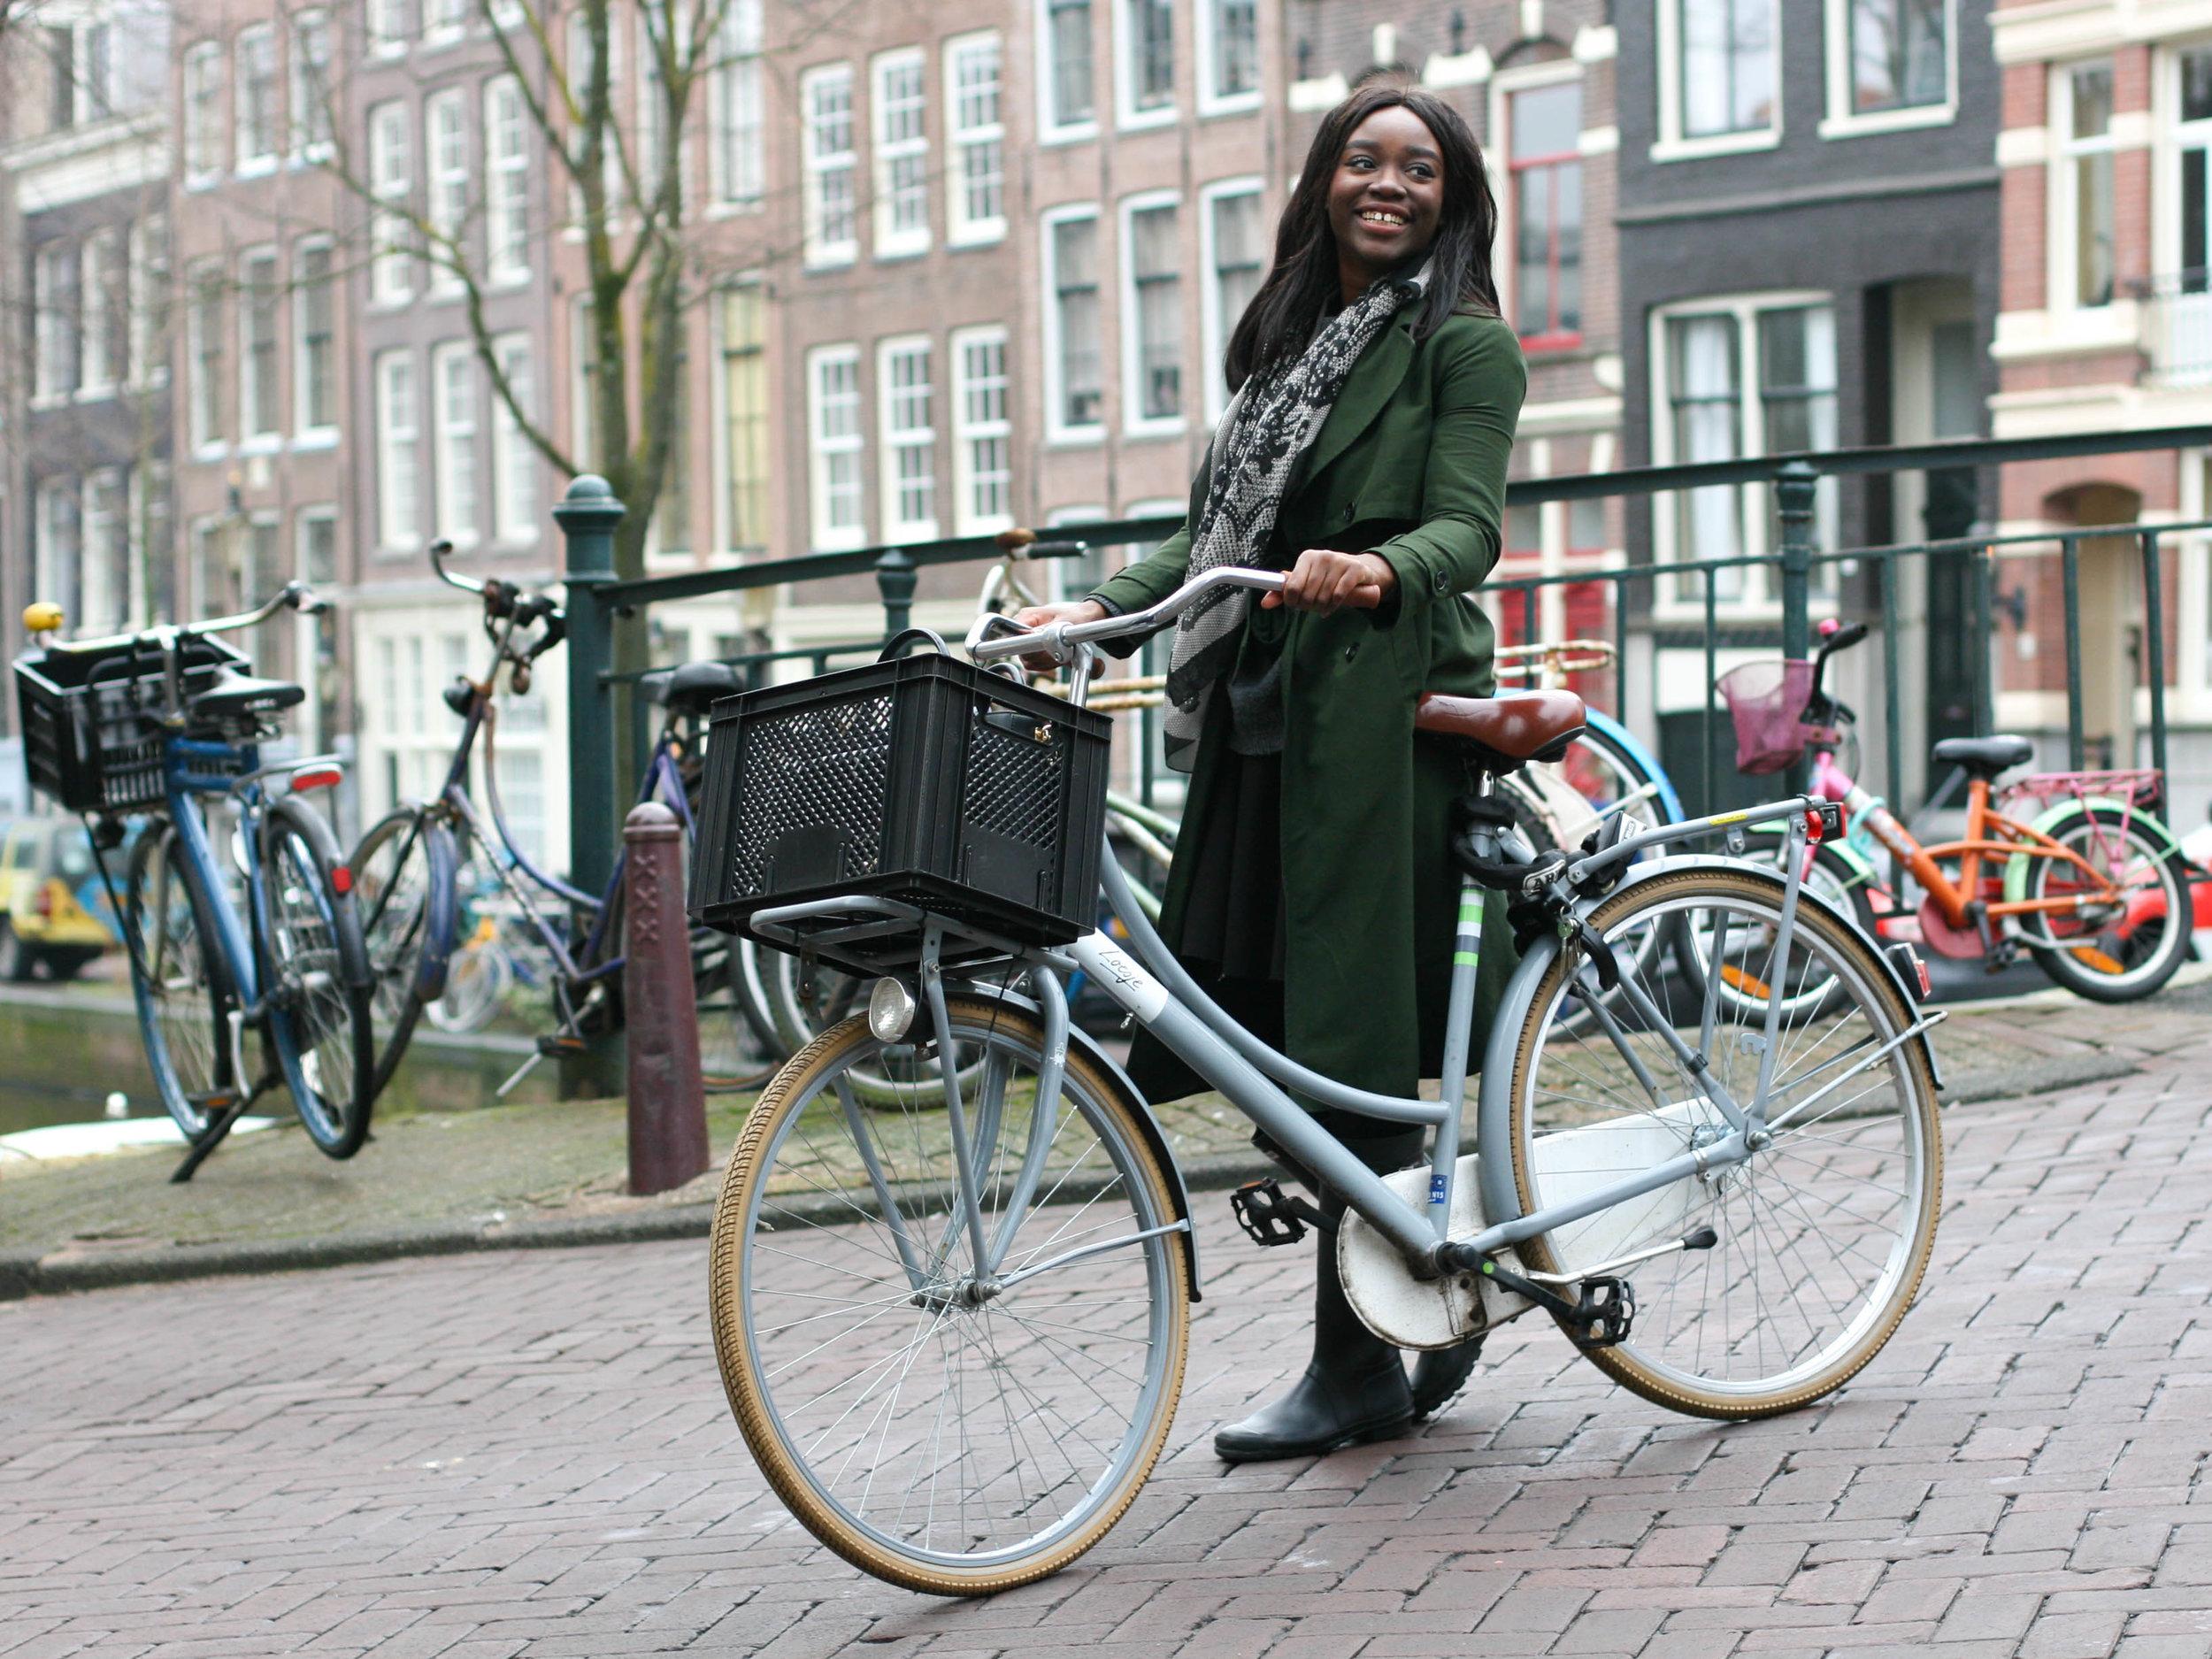 Amsterdam-Cycle-Chic-March-4.jpg